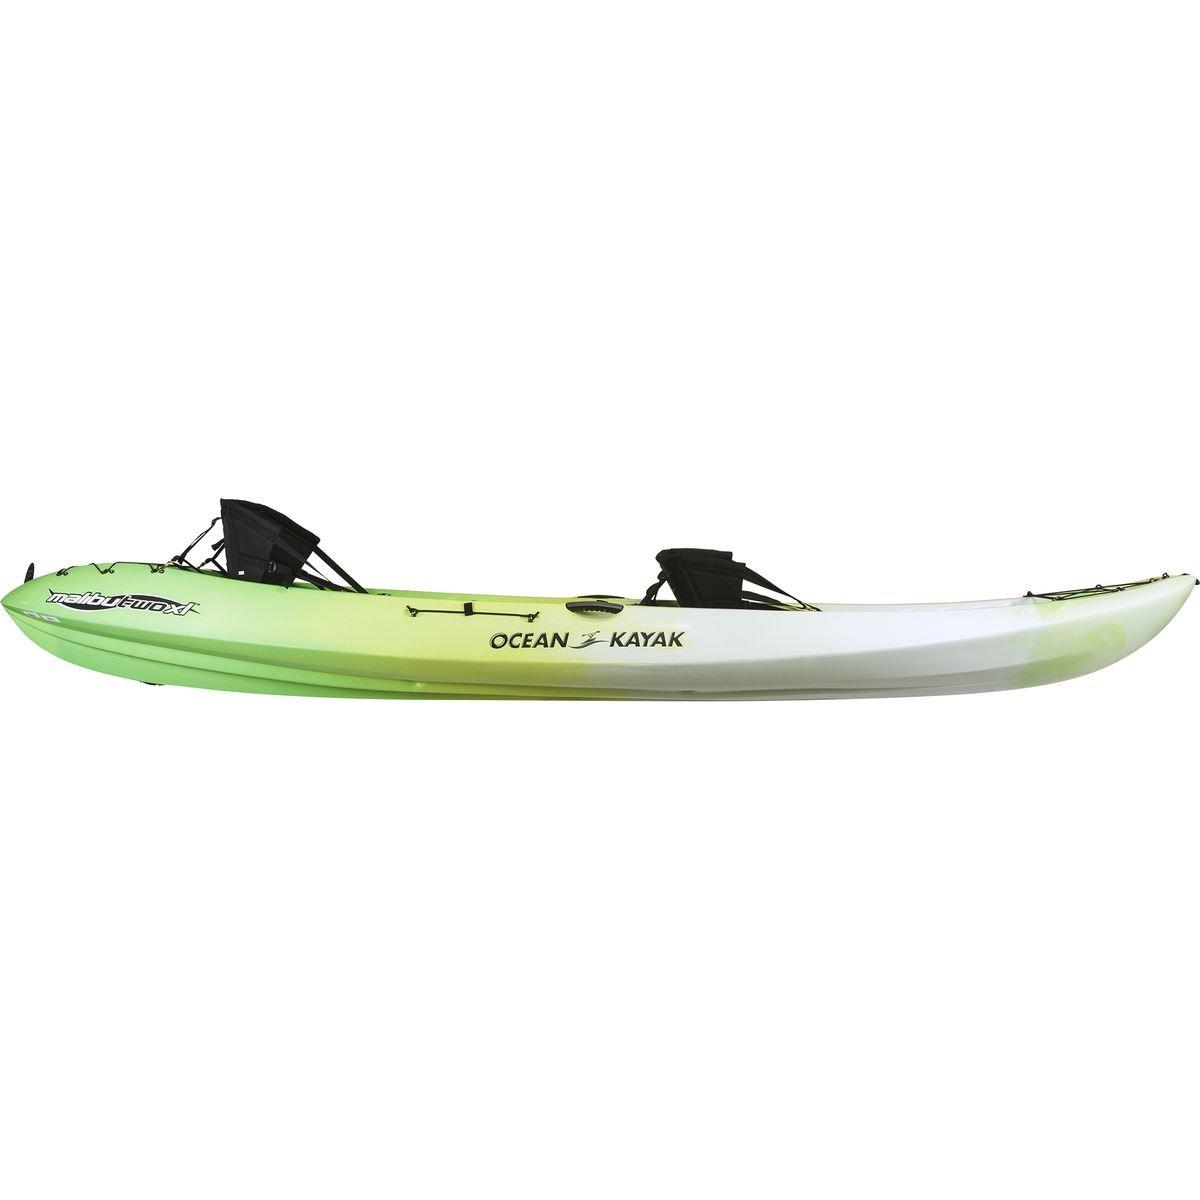 Ocean Kayak Malibu Two XL Tandem Kayak Envy, One Size